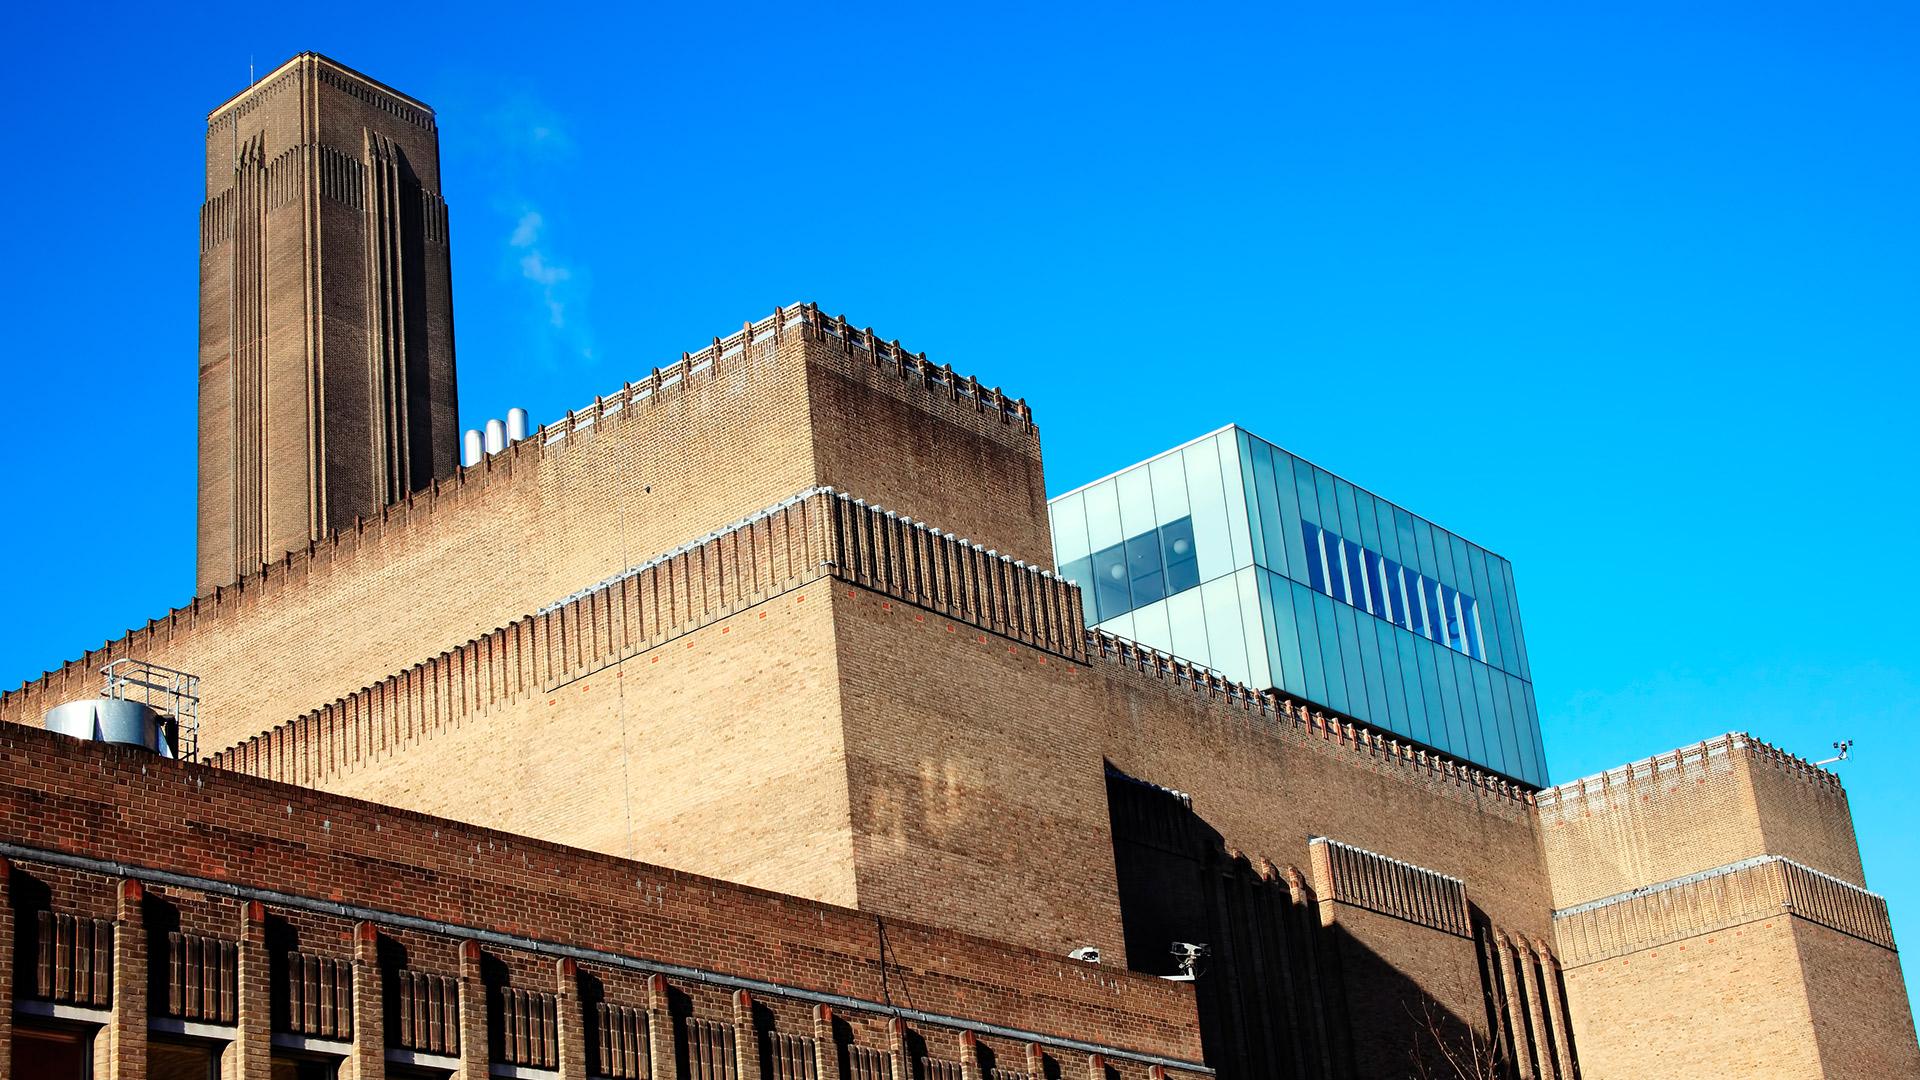 Tate Modern crece hero asset